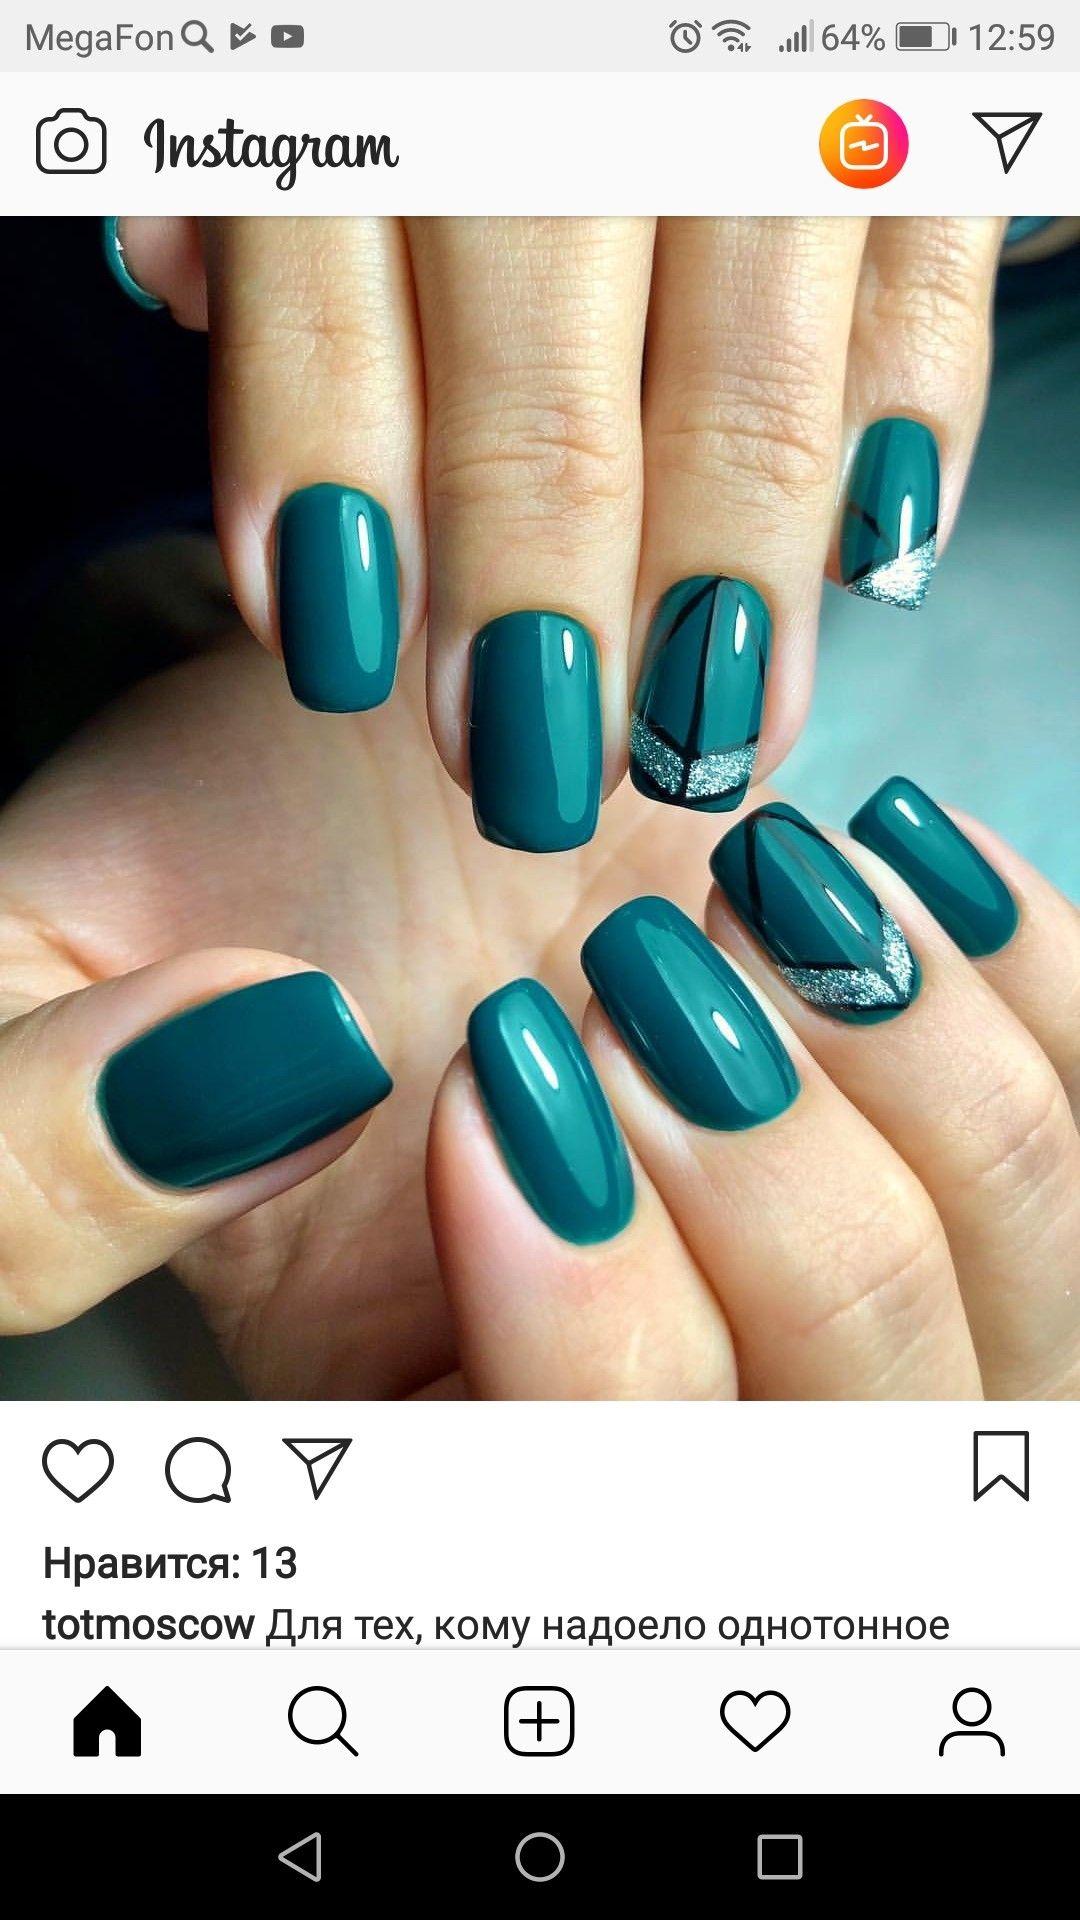 Pin by Cathy Culver on Nails in 2019 | Nail designs, Nail ...